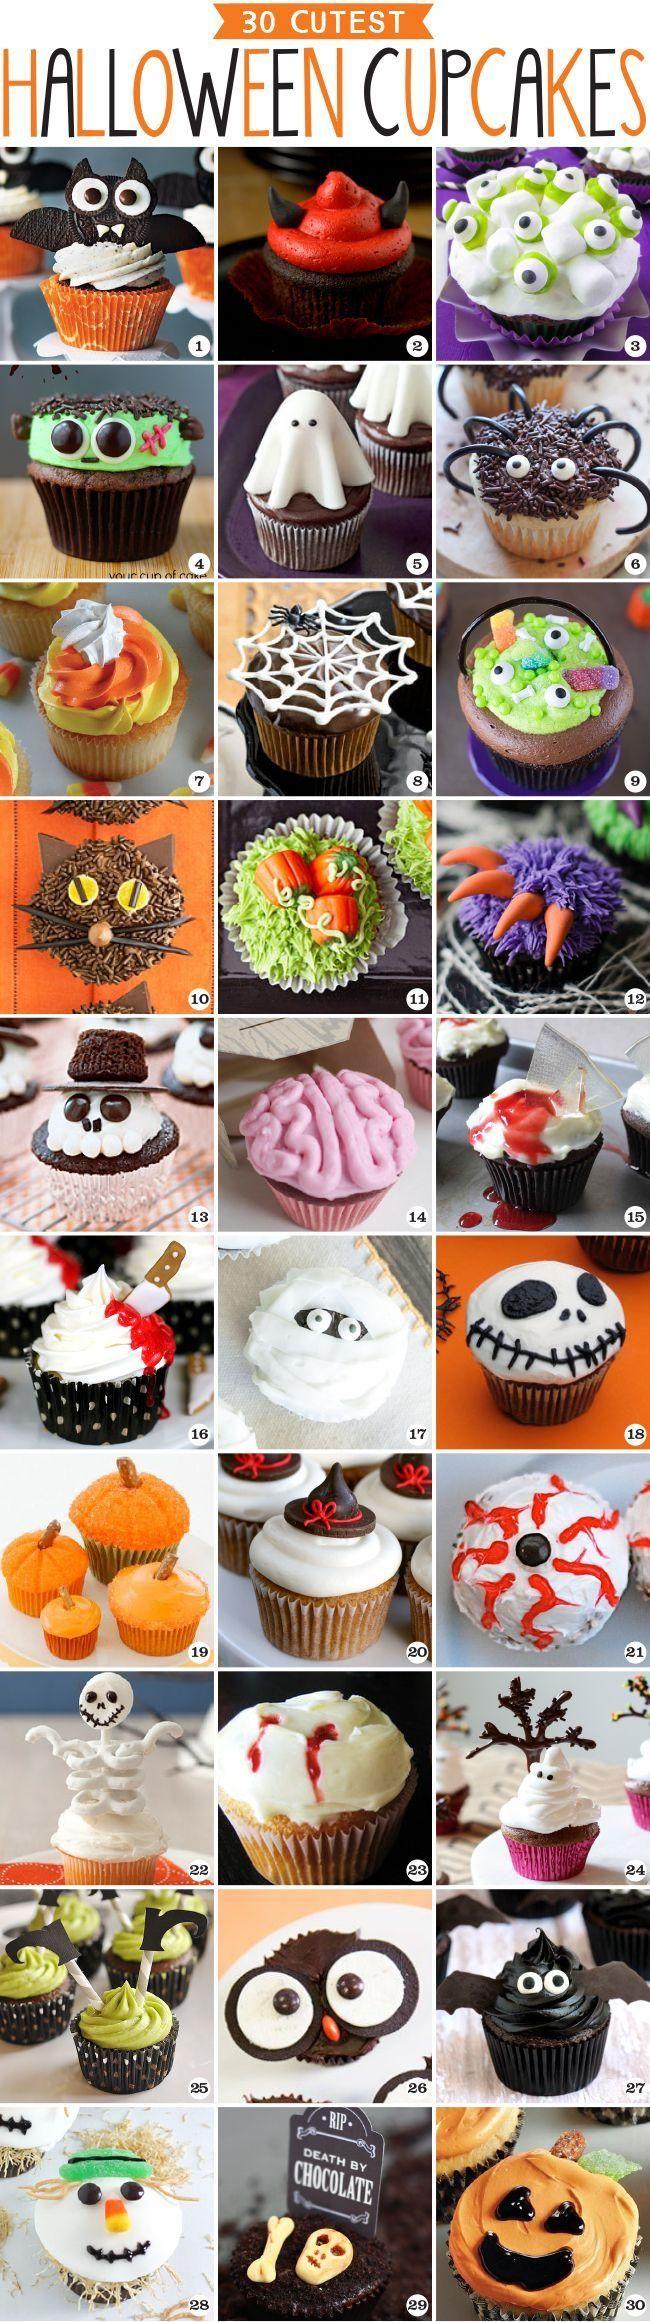 30-Cutest-Halloween-Cupcakes.jpg 650×2,322 pixels